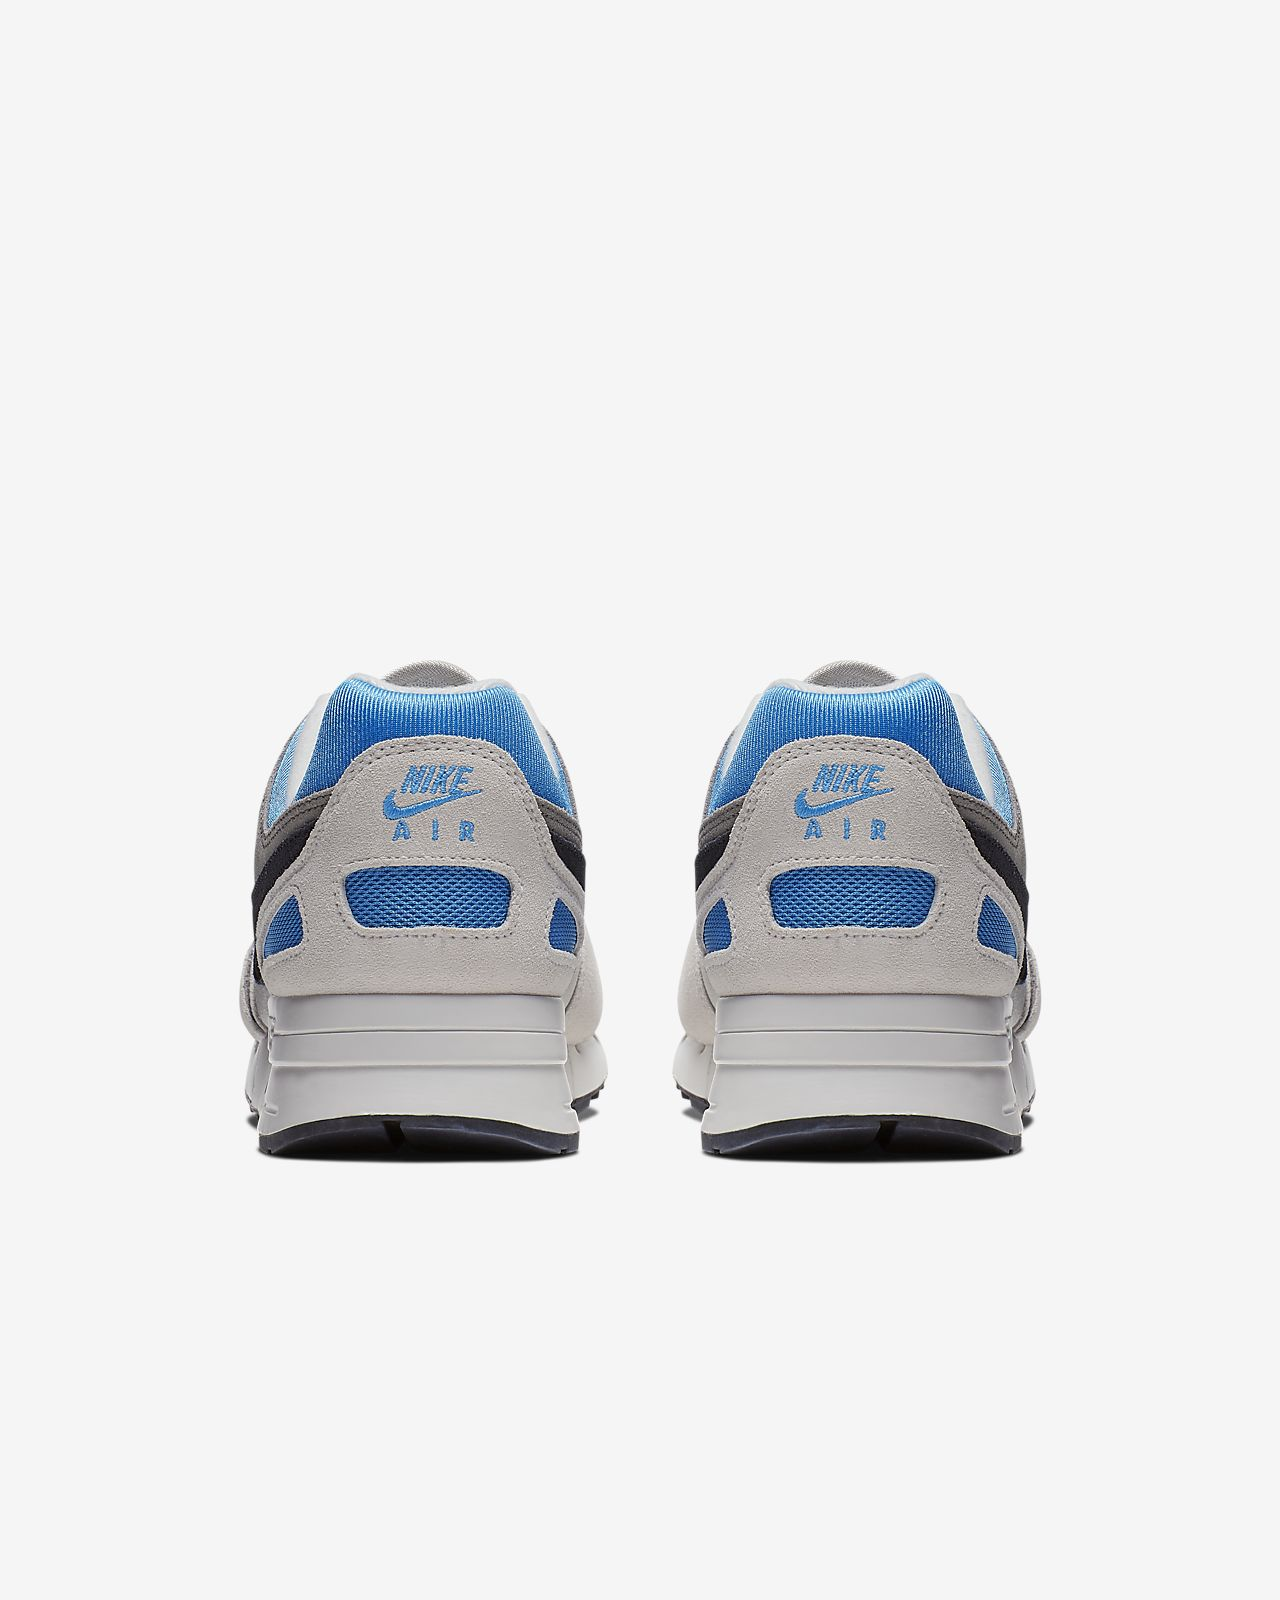 Se Pegasus Homme '89 Chaussure Air Pour Nike vgIbf6y7Y